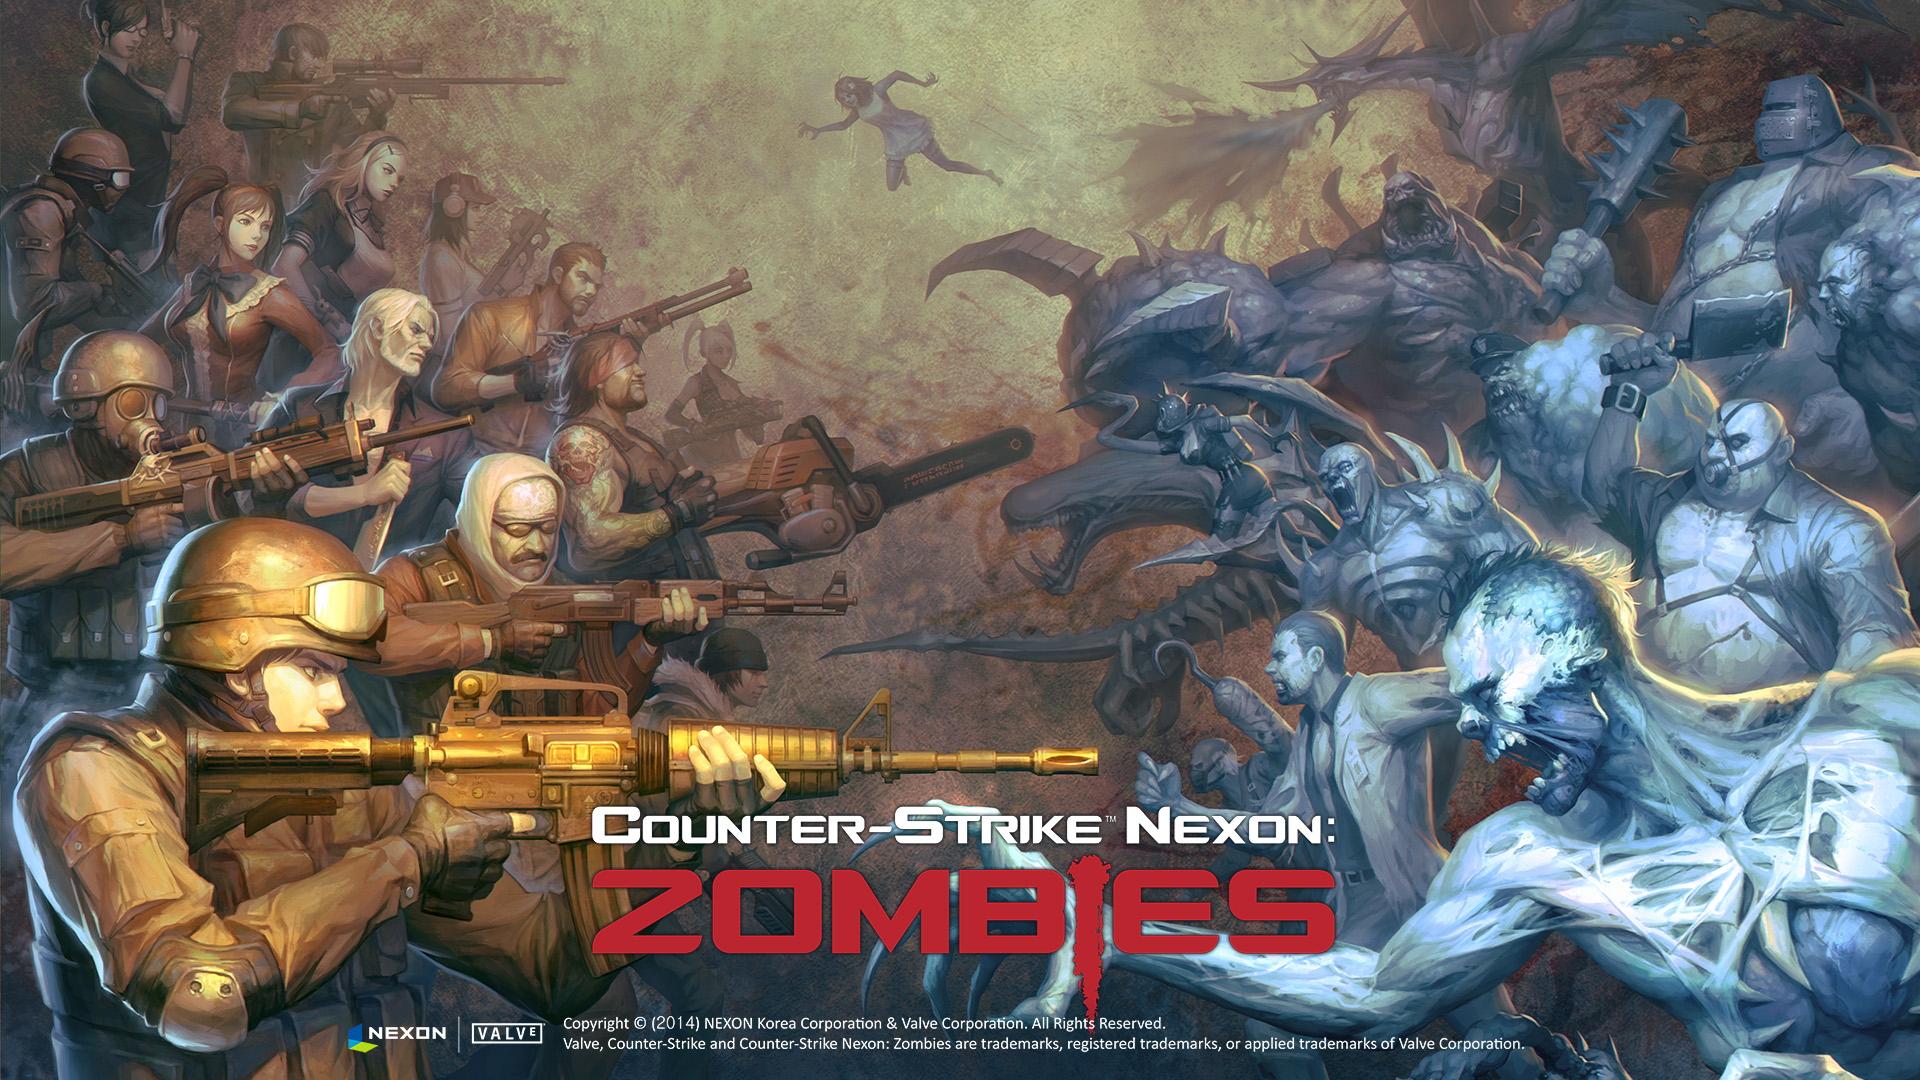 [PC] Counter-Strike Nexon: Zombies dl ⋆ Games Online PRO